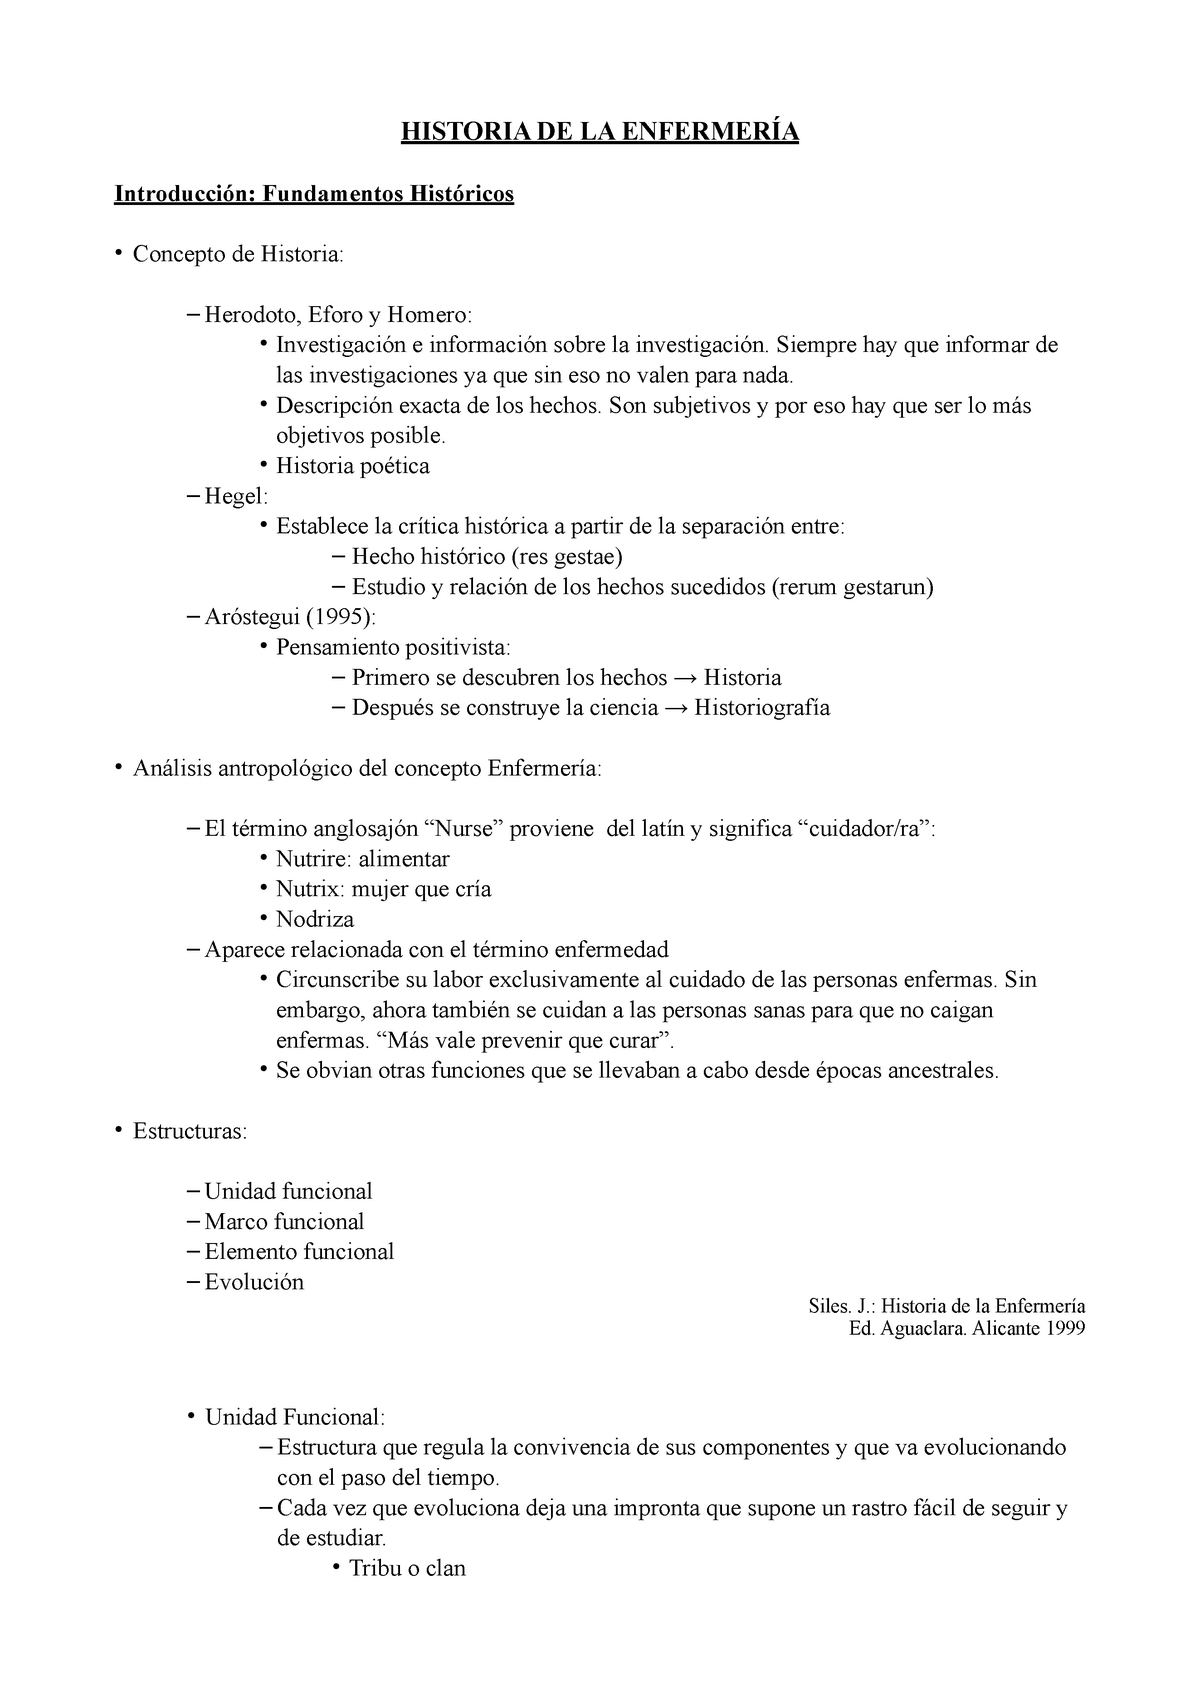 Apuntes Temas 1 17 Bases Teóricas De Enfermería 0004